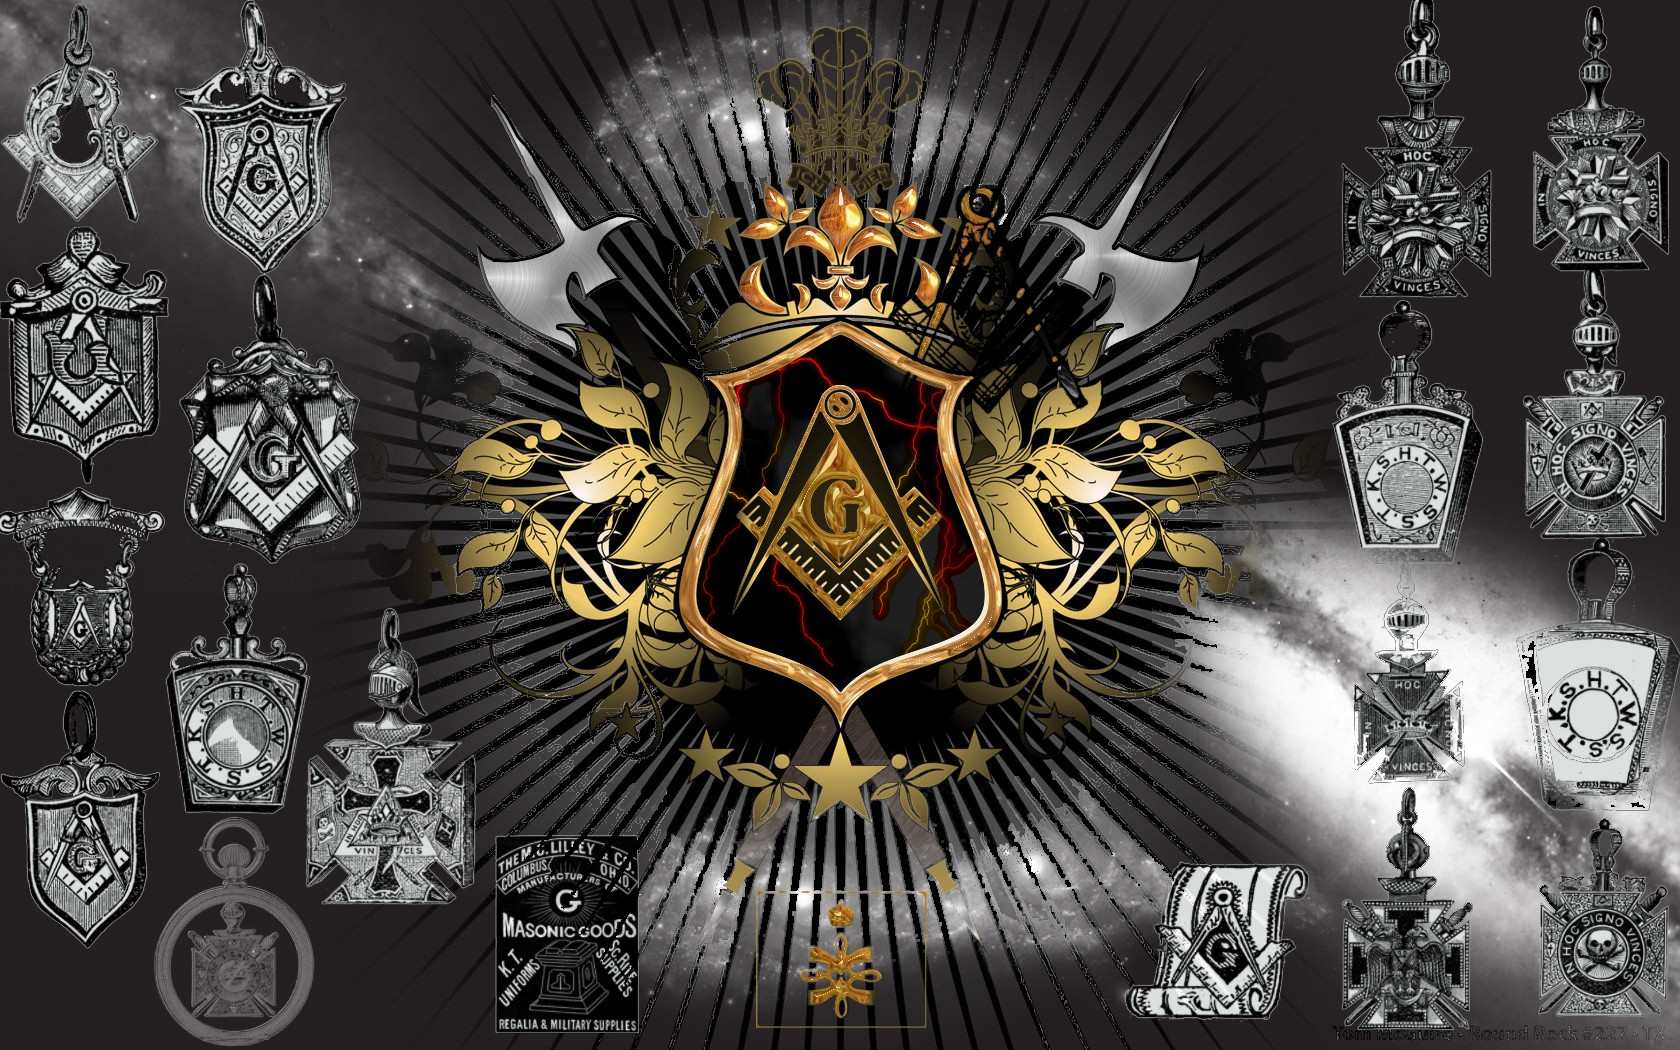 Masonic Wallpaper Cool HD Wallpapers 1680x1050